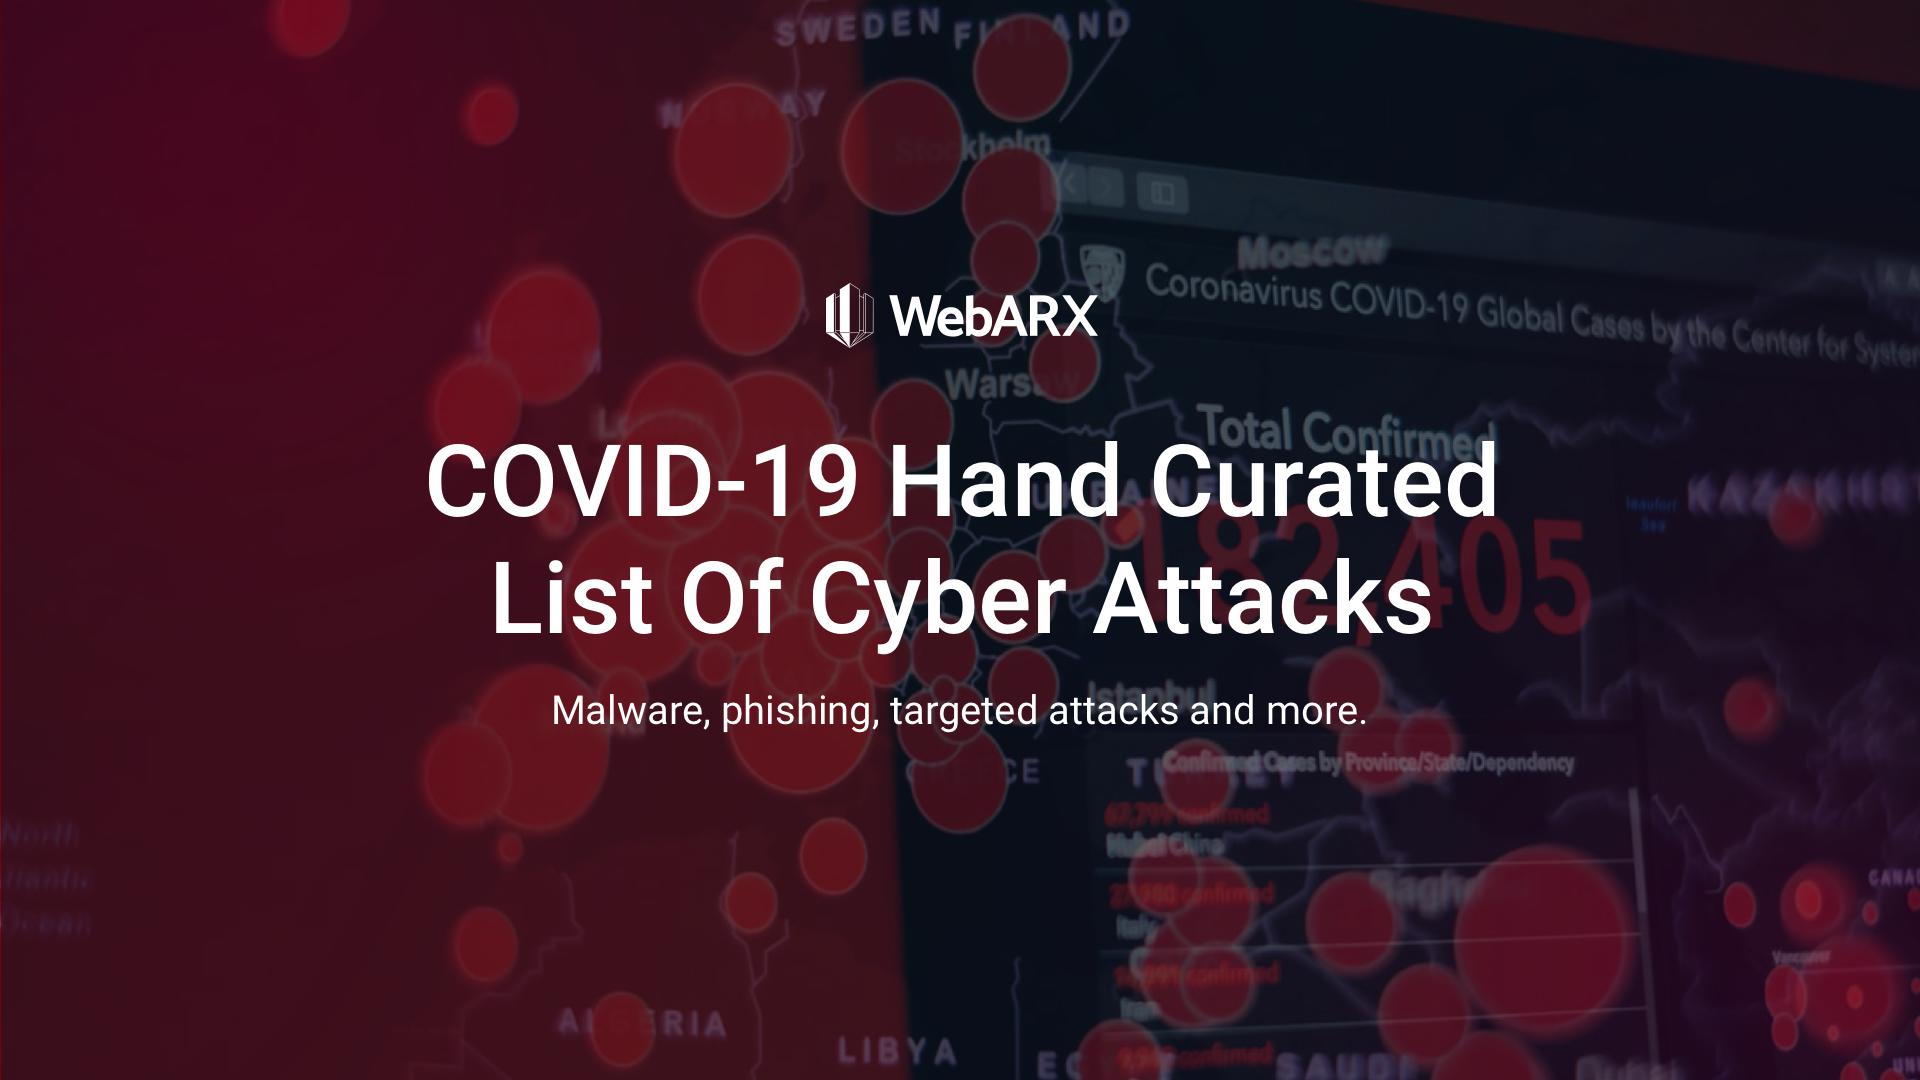 COVID-19 Cyber Attacks - WebARX Security